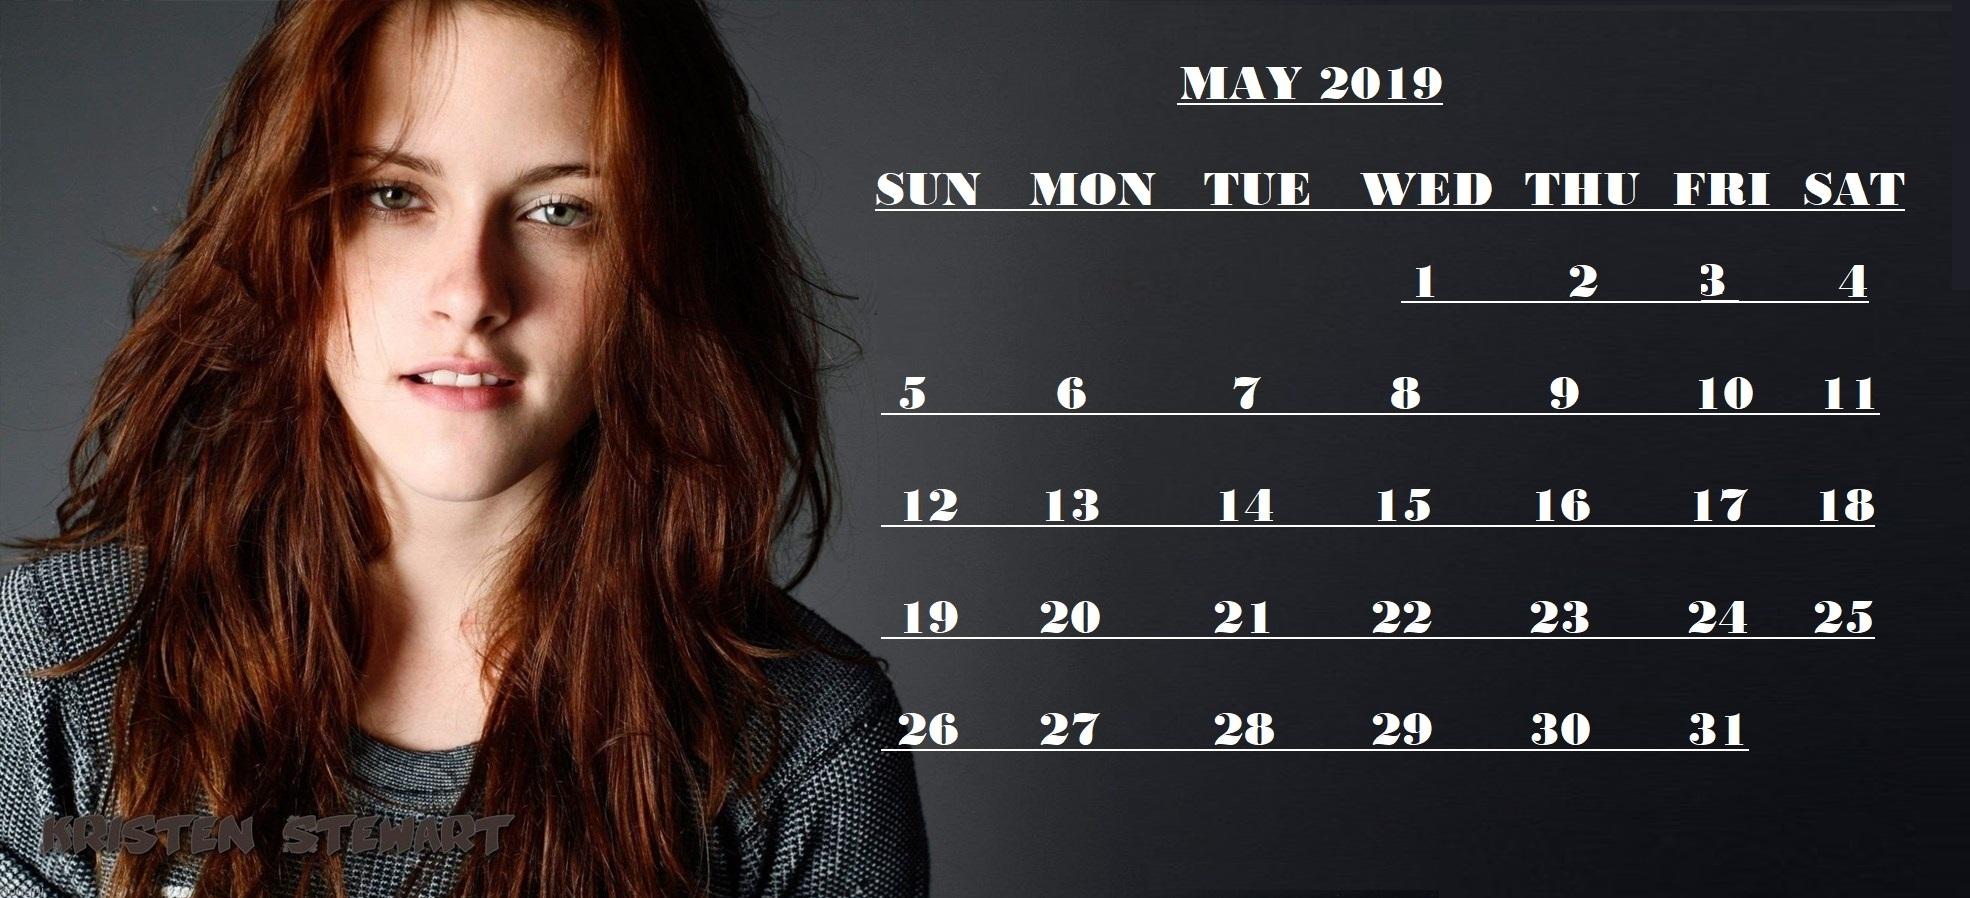 Free May 2019 Calendar Wallpaper